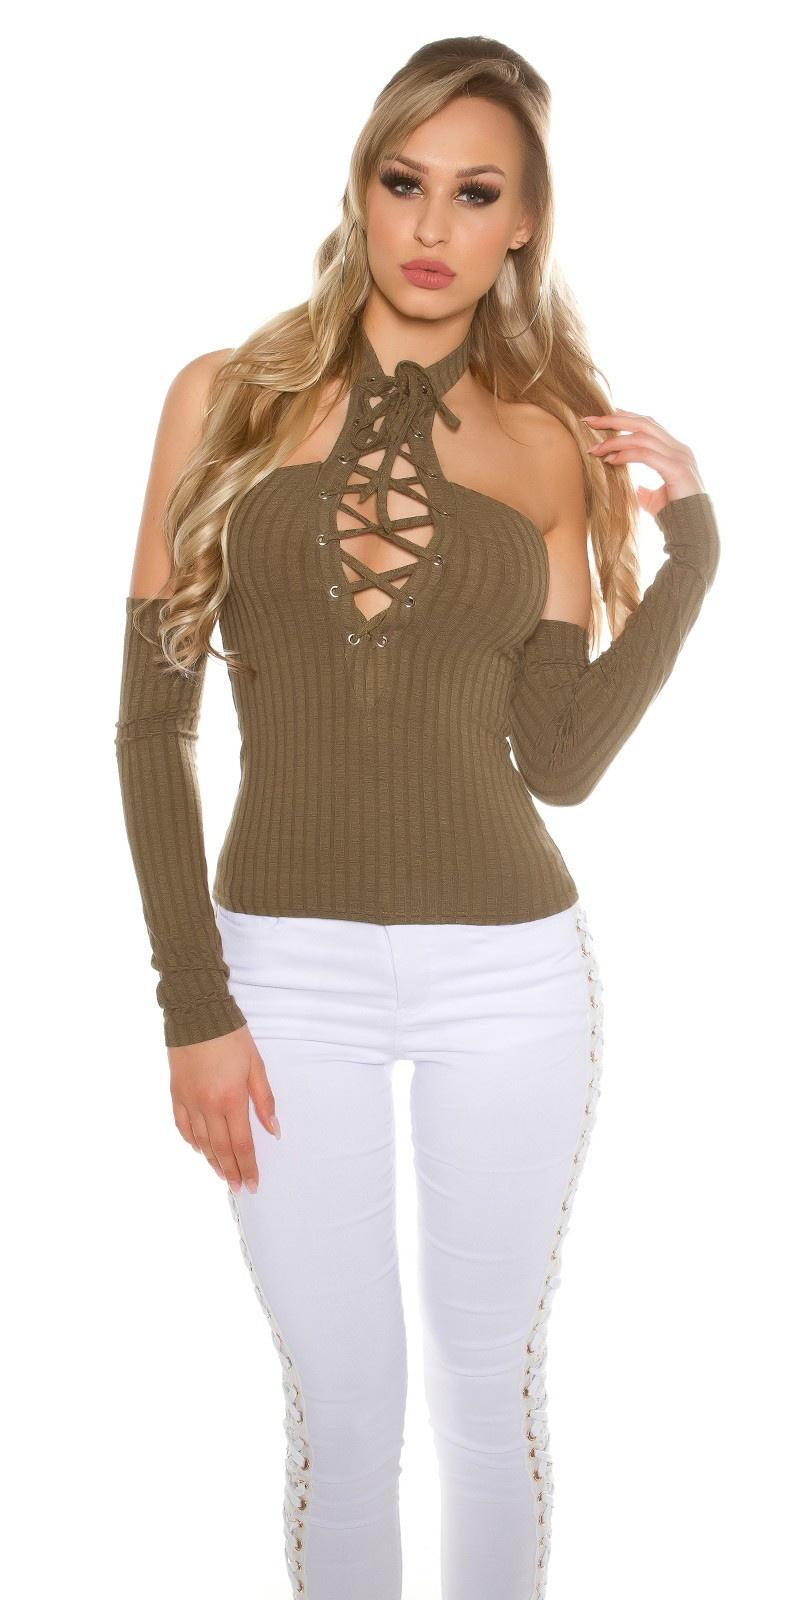 Sexy Neck Shirt shoulder-free w.laced decollete Khaki